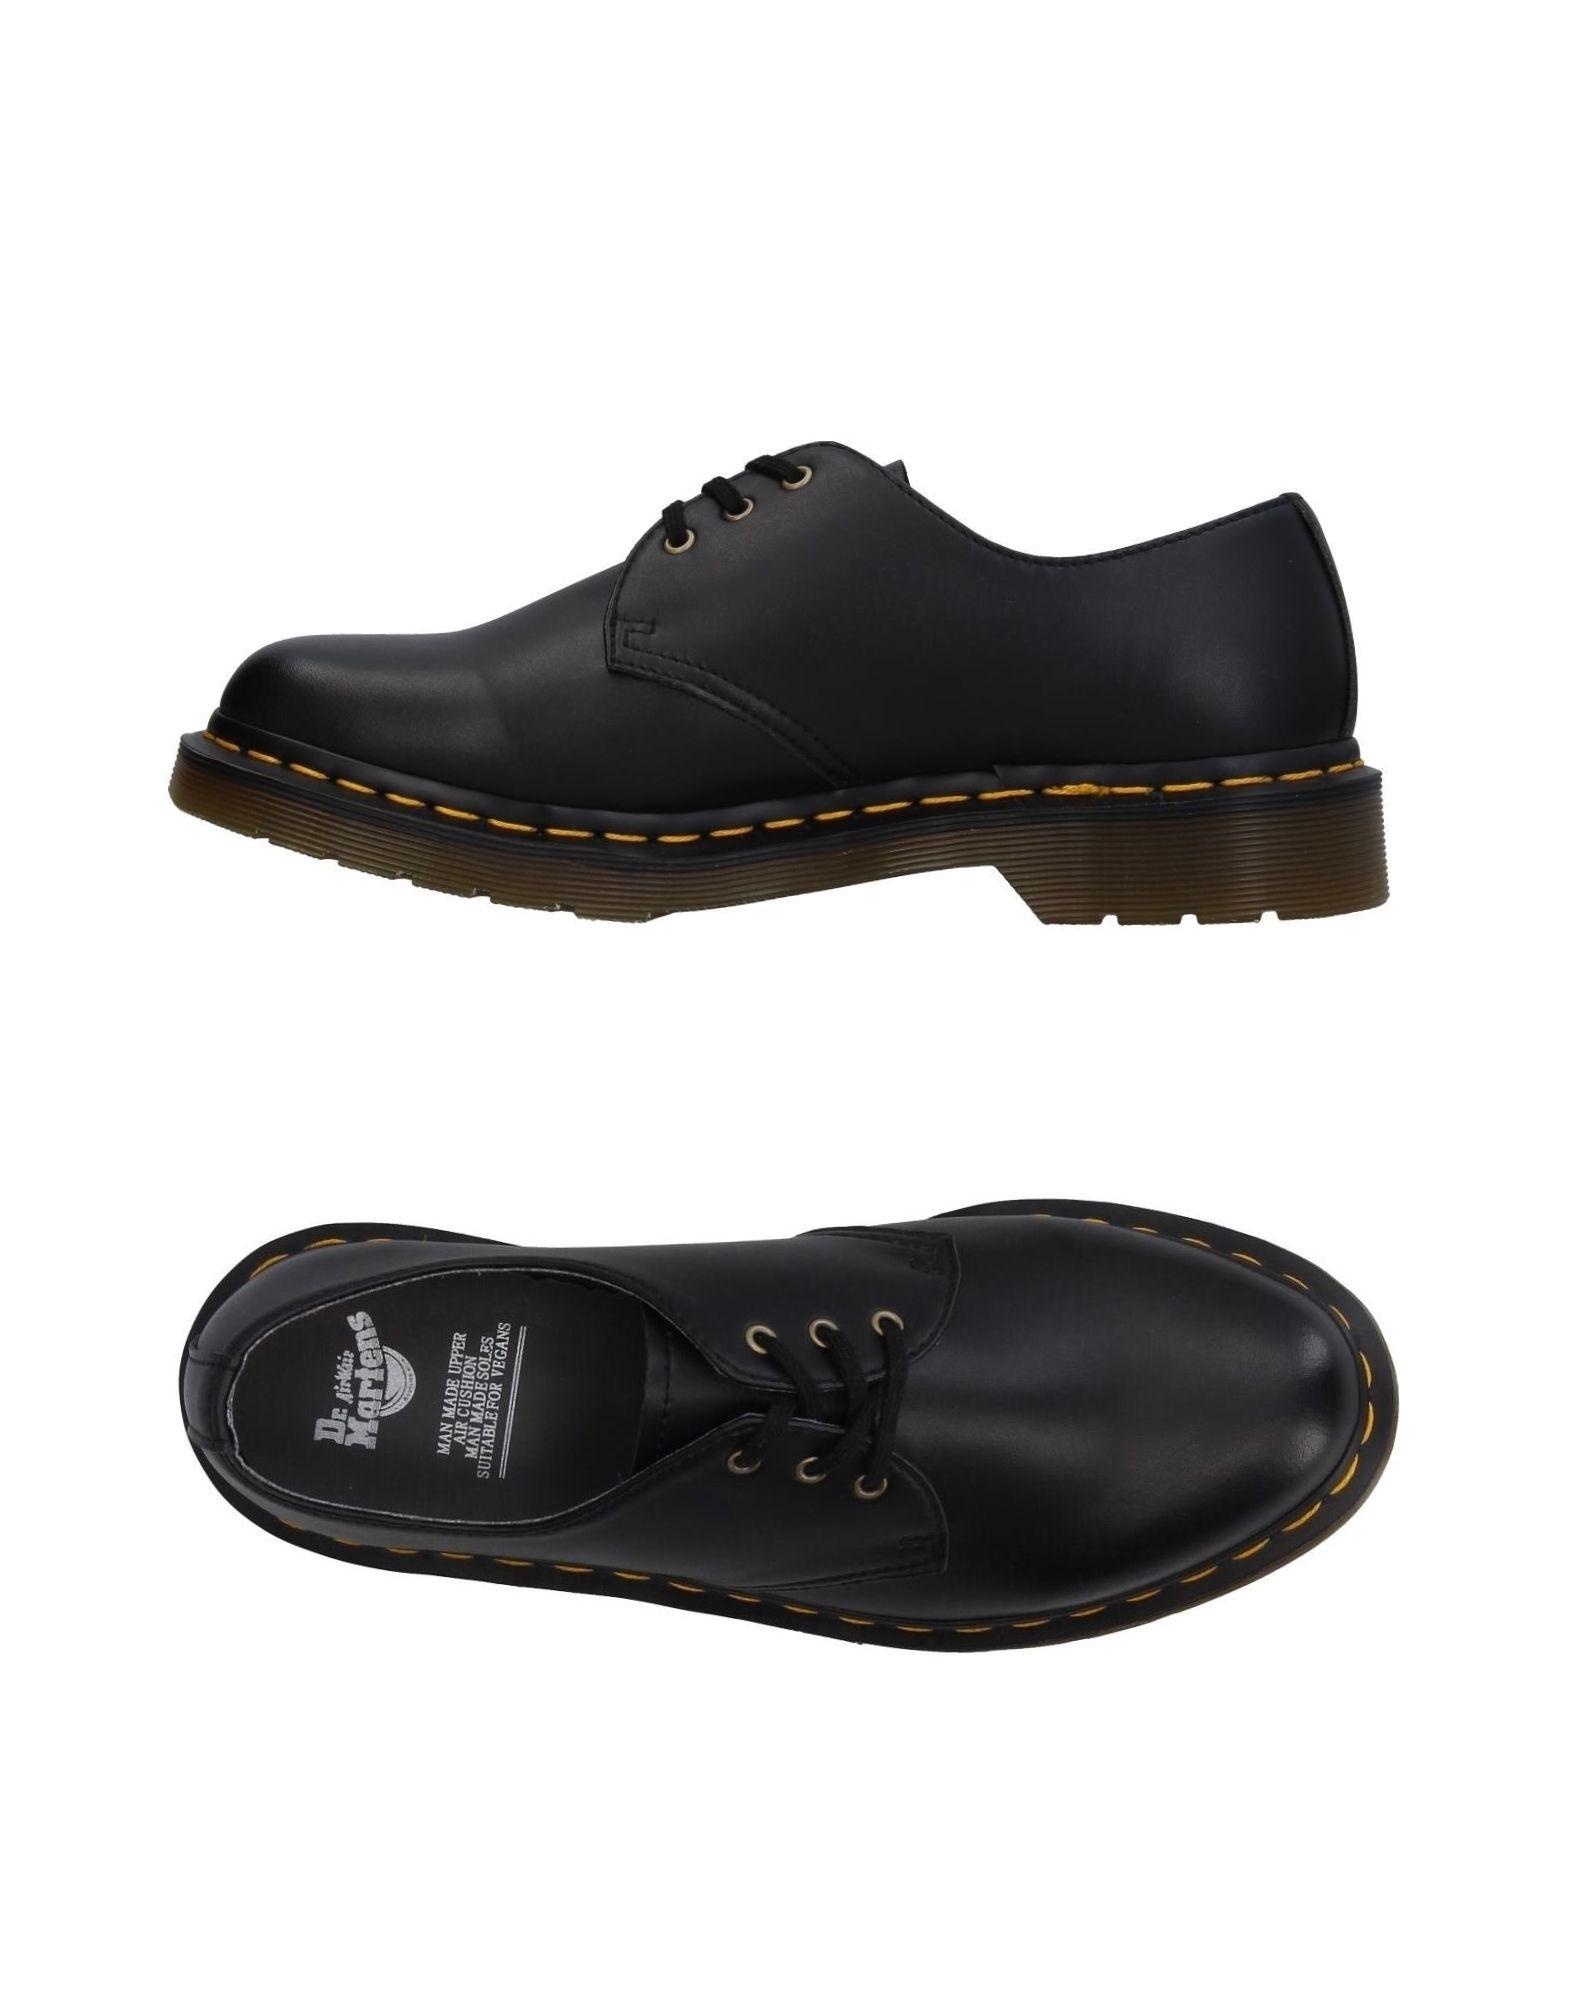 Dr. Martens Schnürschuhe Damen  11375878JE Gute Qualität beliebte Schuhe